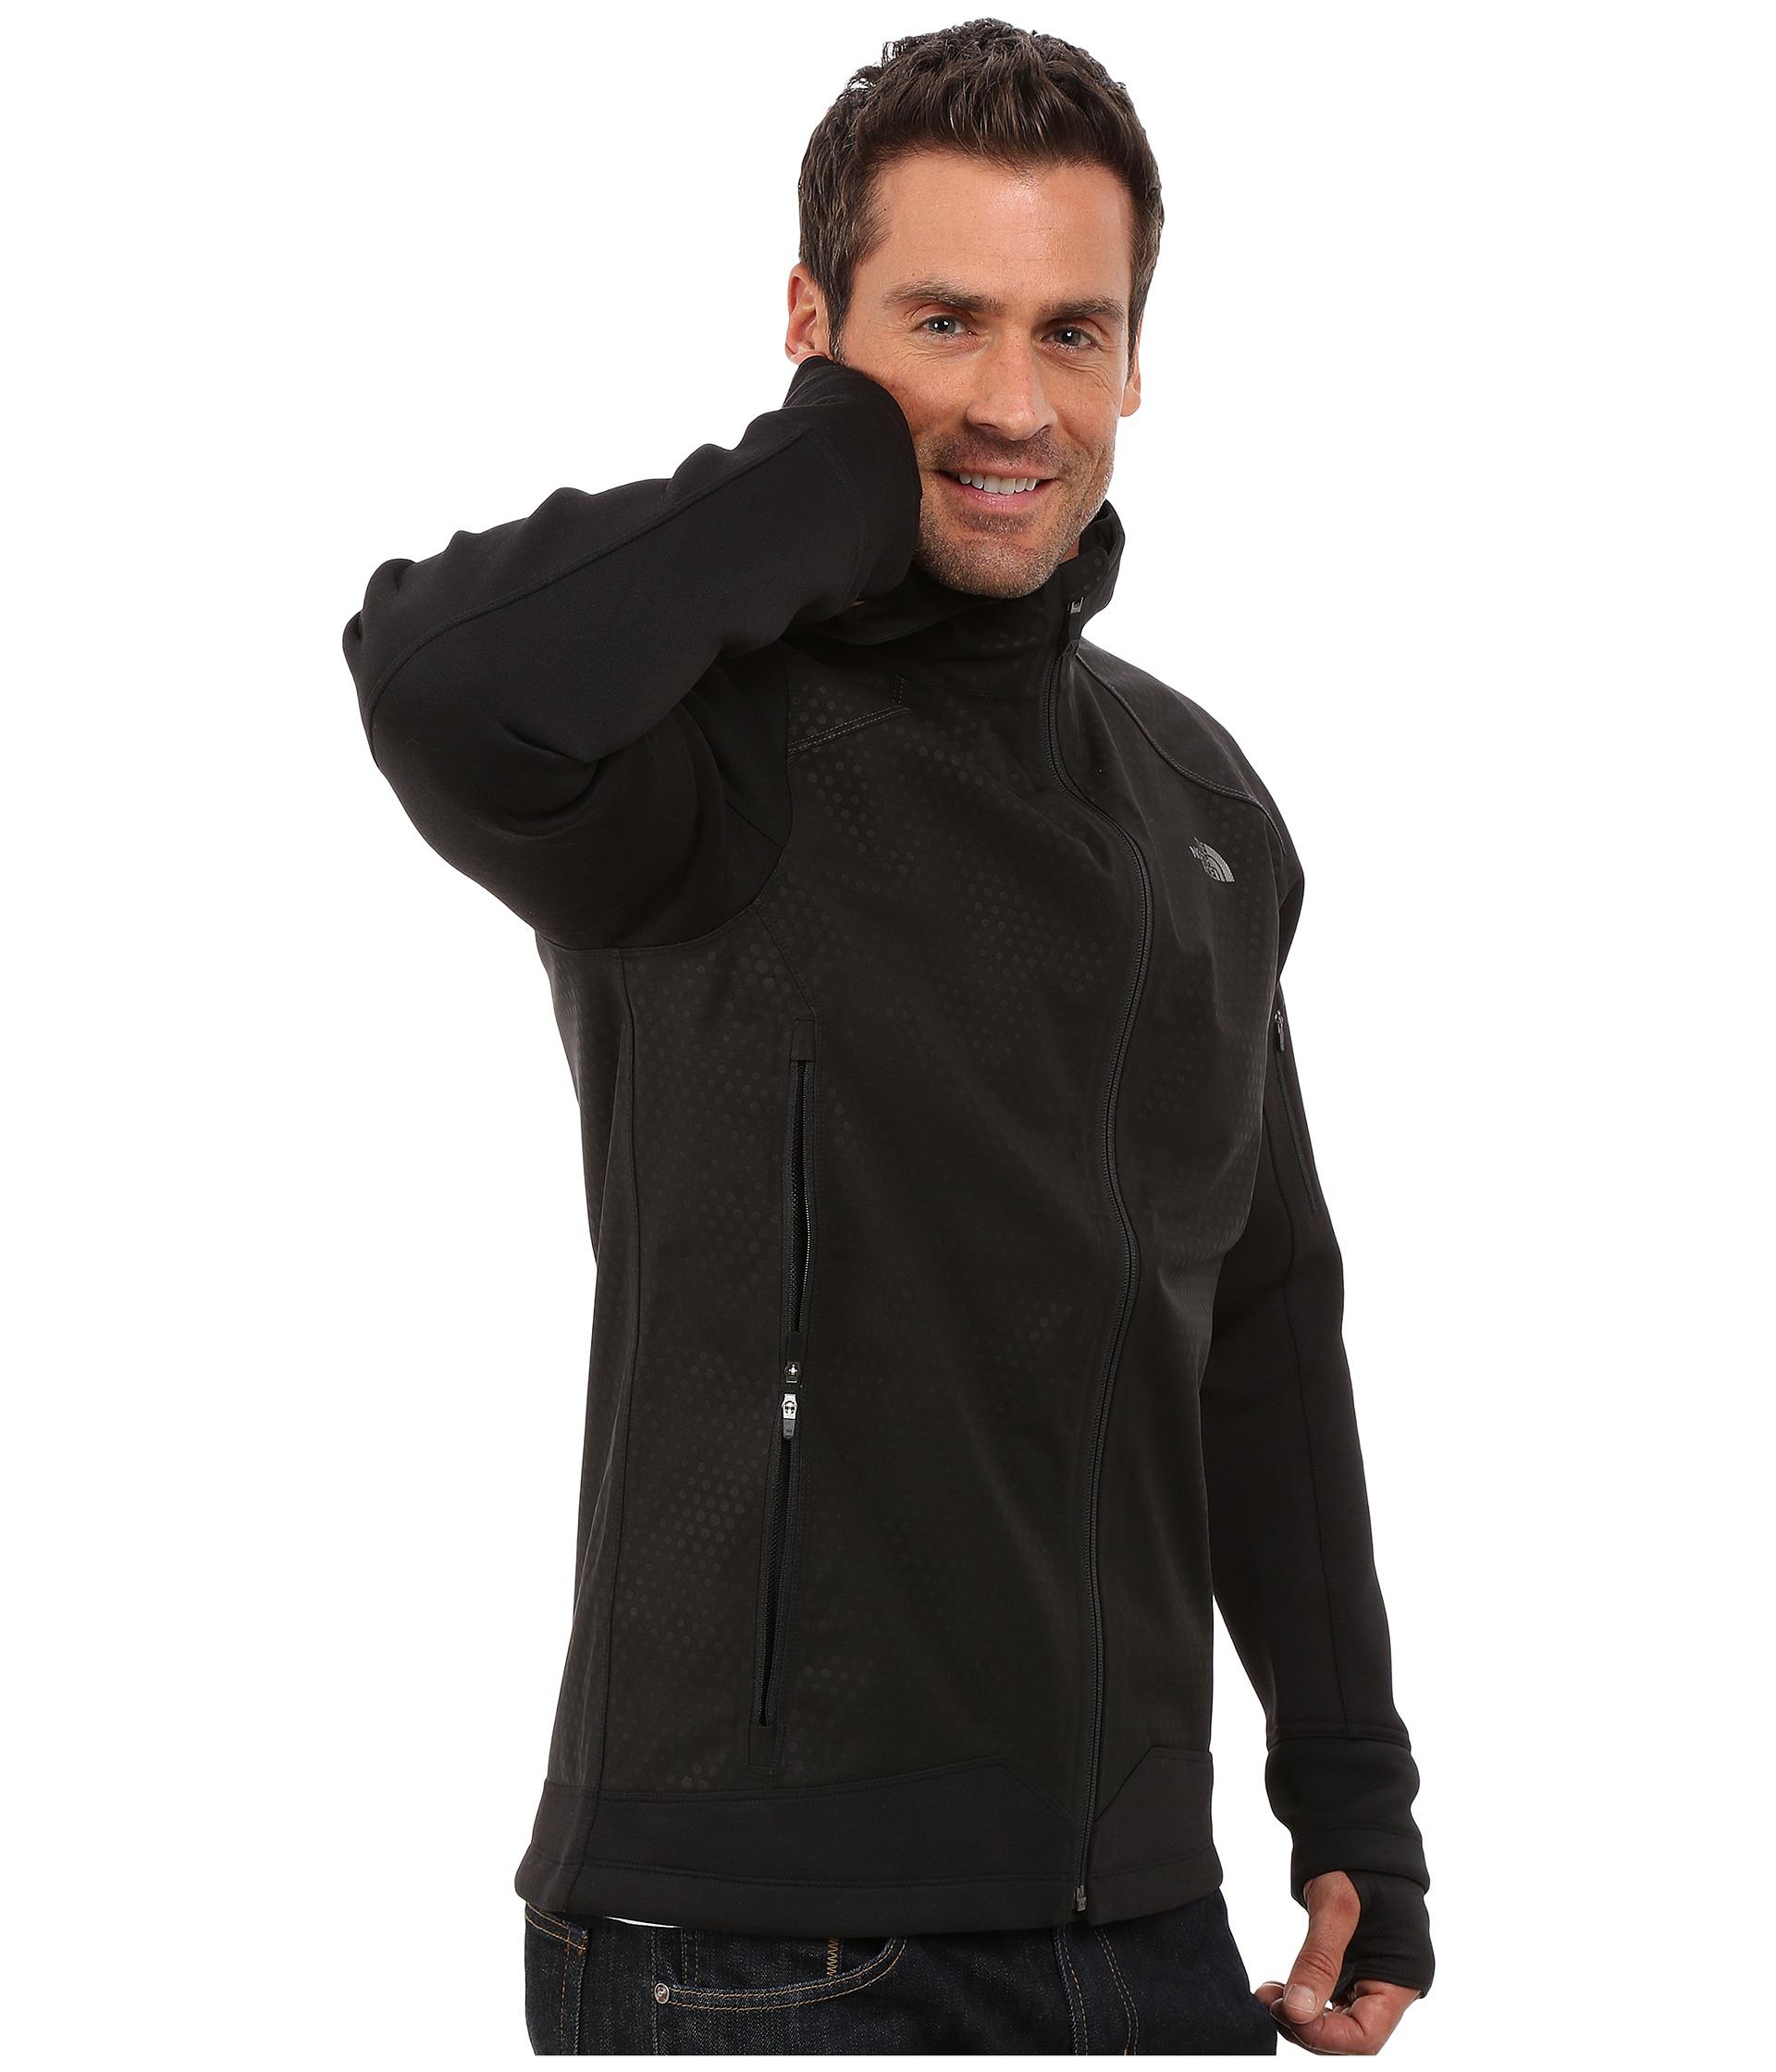 940747dc1cba ... switzerland lyst the north face kilowatt ops jacket in black for men  cef4f c1a23